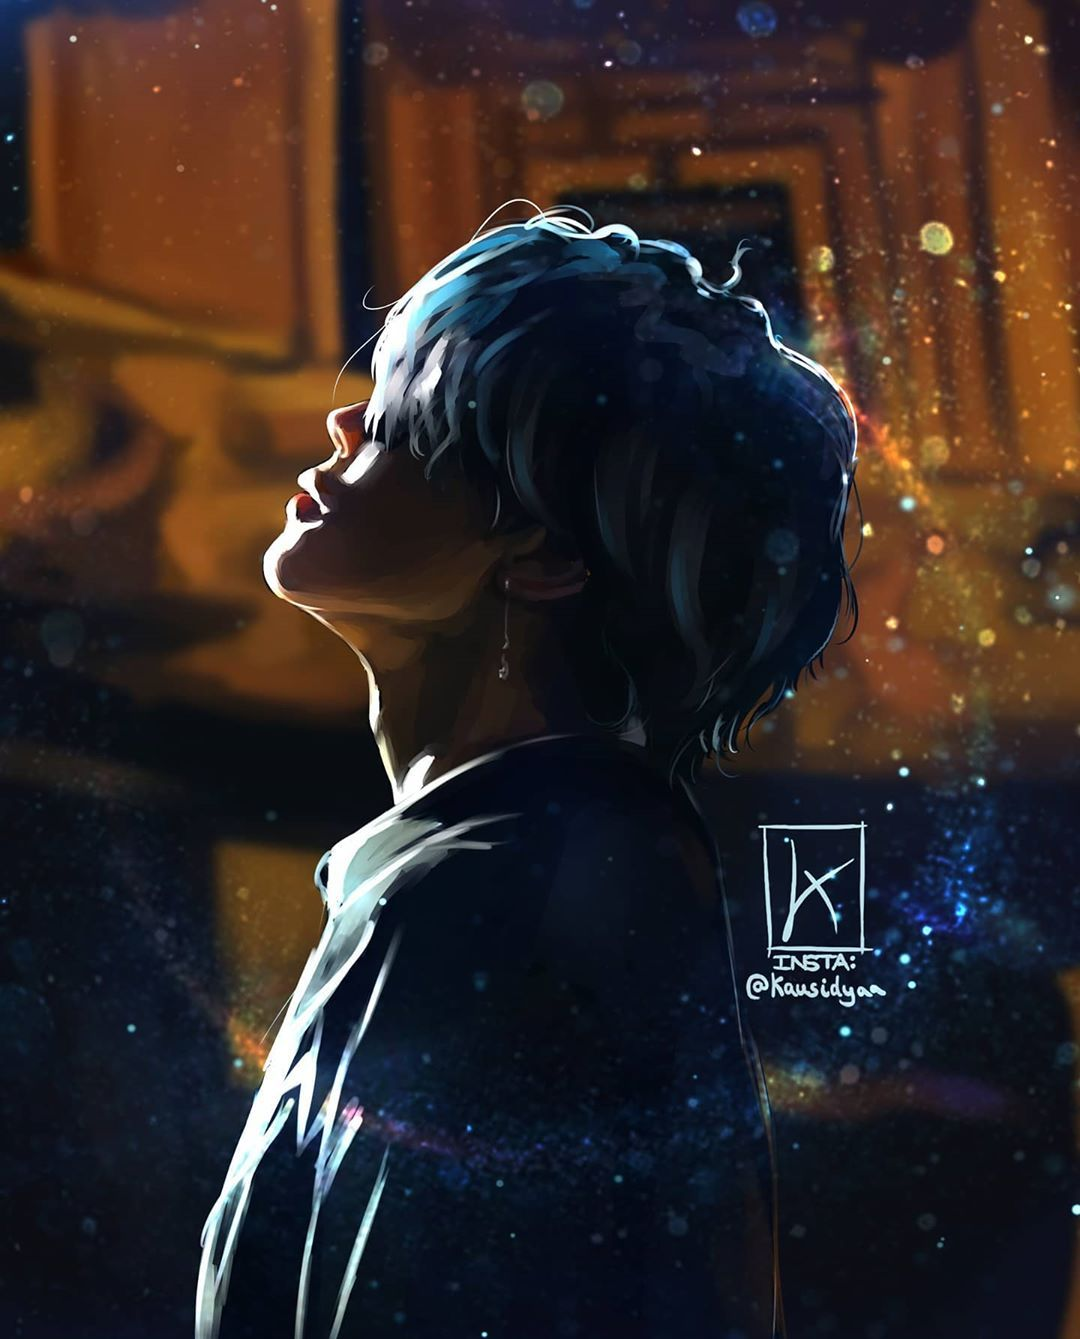 8 633 Curtidas 125 Comentarios Bts Fan Art Jenny Kili Kausidyaa No Instagram Black Swan Jimin Tried A Diffe Jimin Fanart Bts Fanart Korean Artist